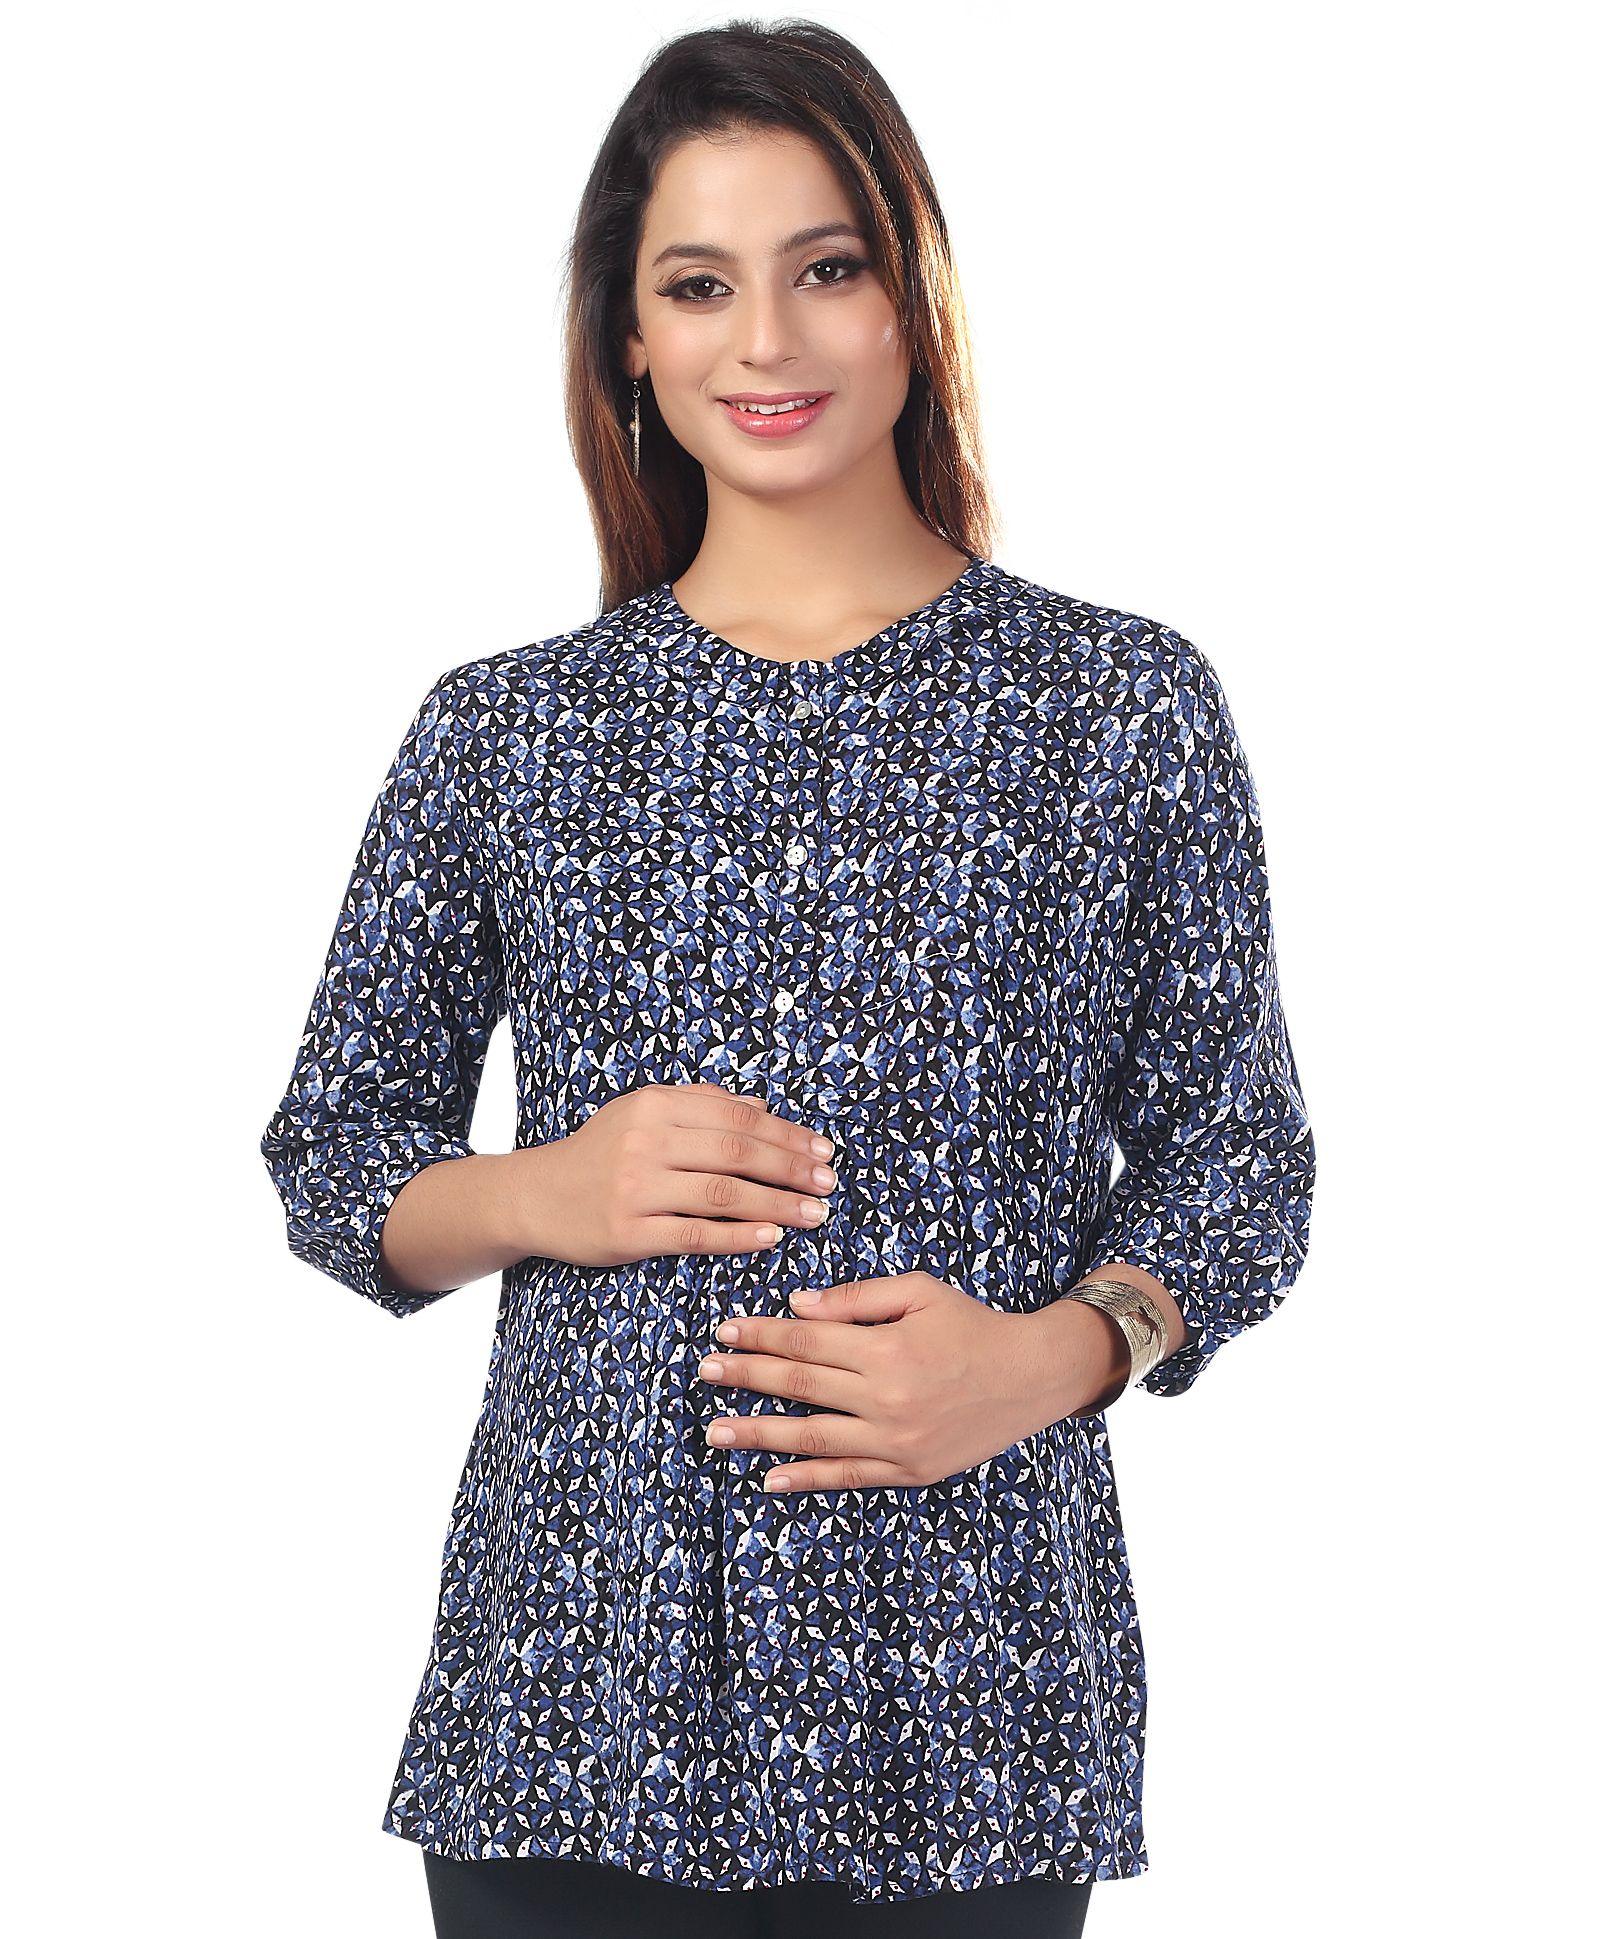 dad92717354 Women Kriti Maternity Price List in India on June, 2019, Kriti ...